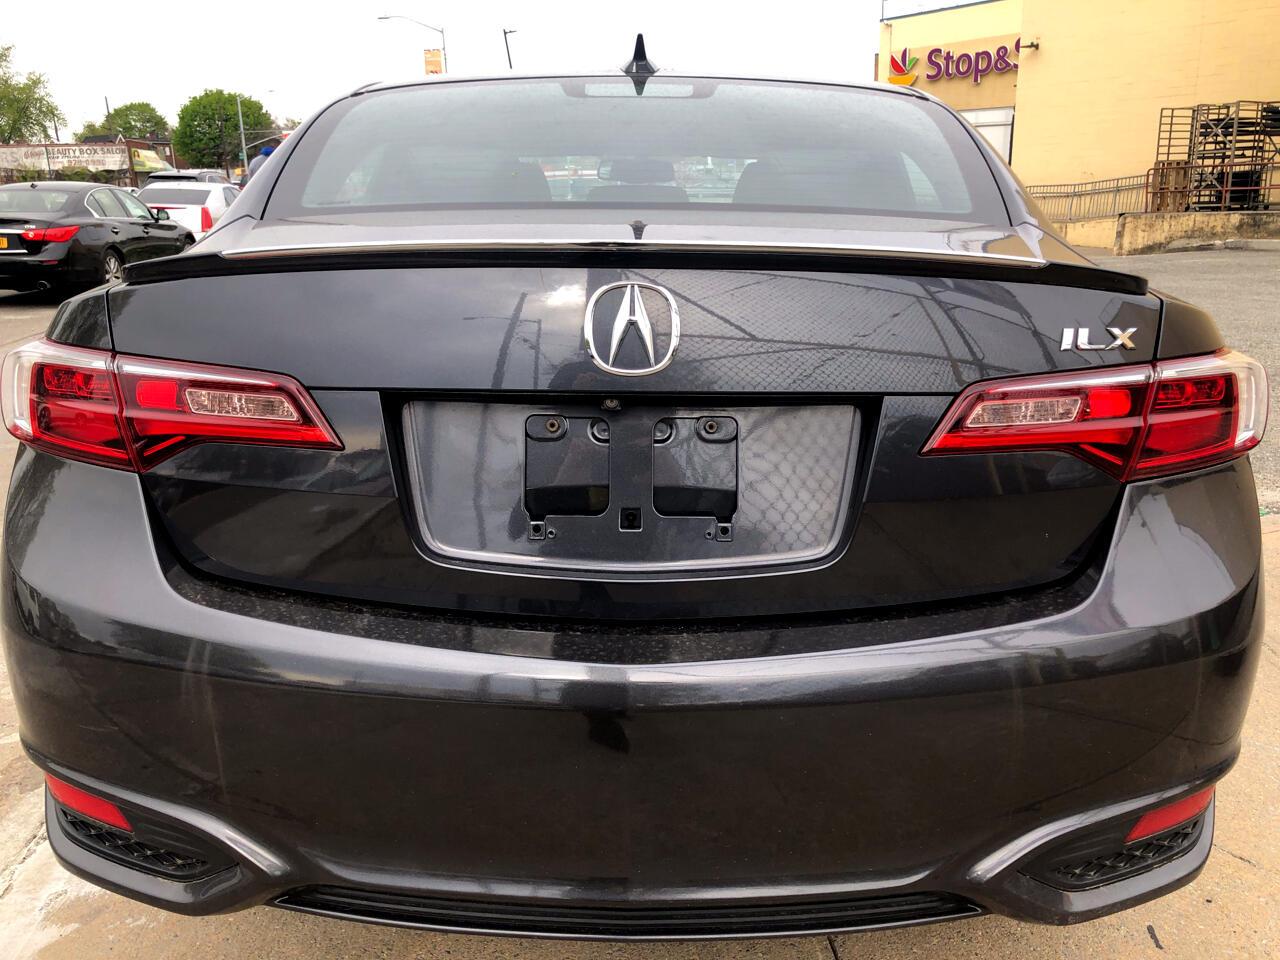 2016 Acura ILX 4dr Sdn w/Technology Plus/A-SPEC Pkg